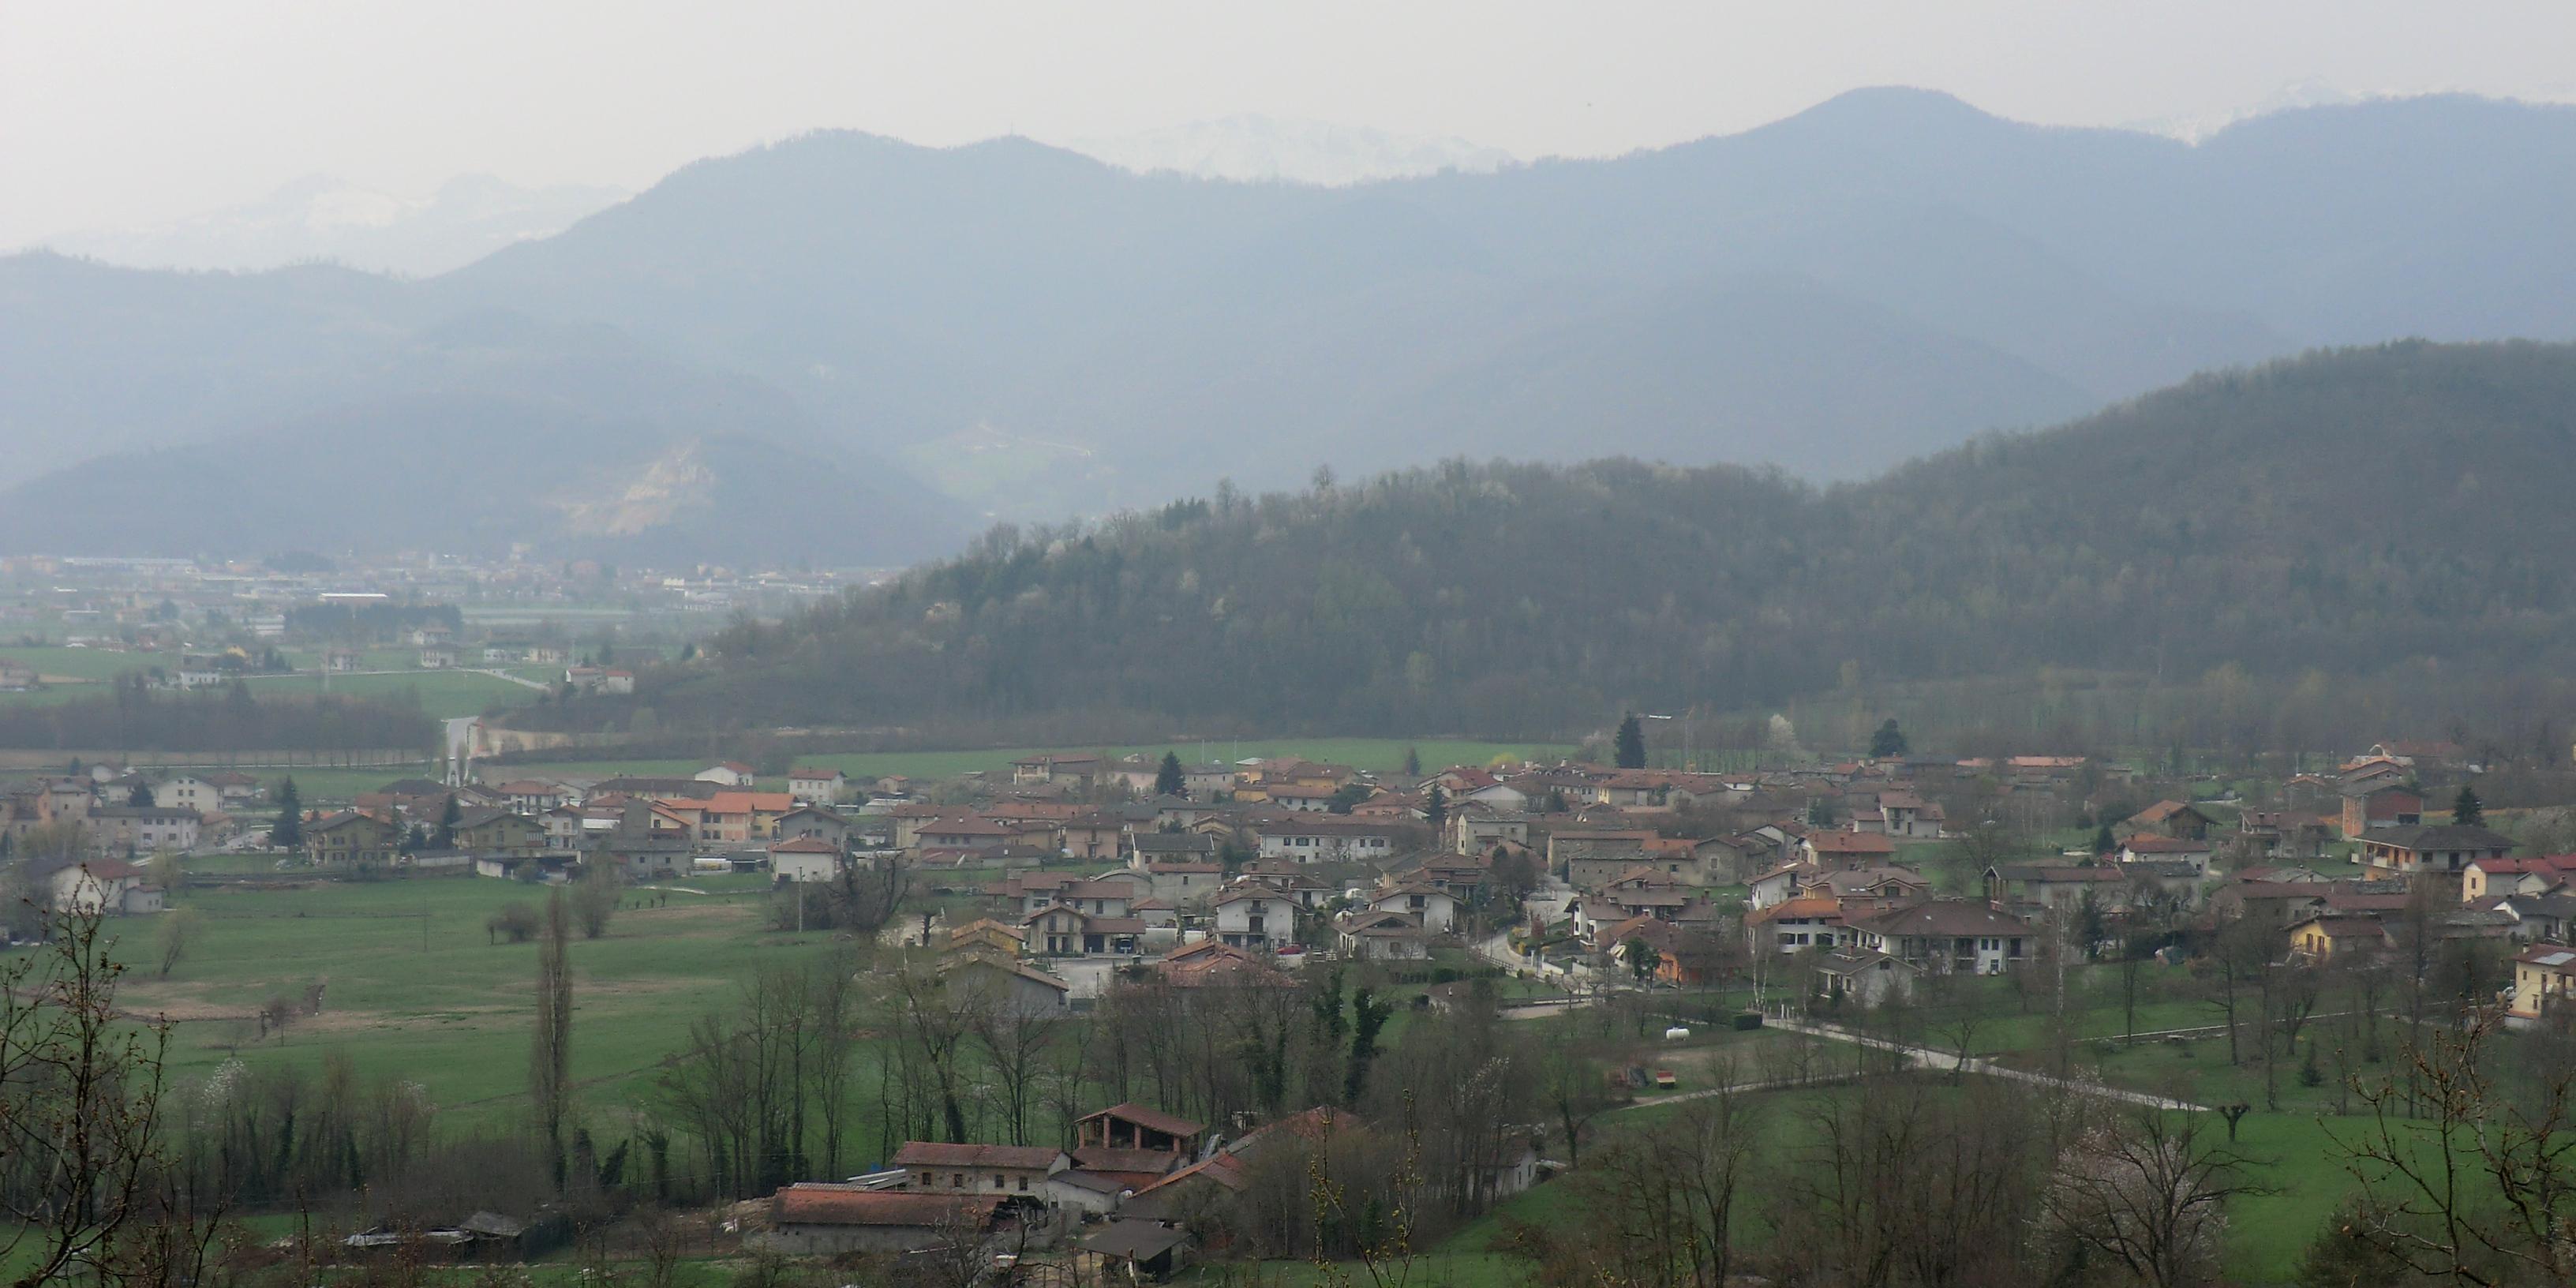 Villar San Costanzo - Wikipedia, la enciclopedia libre